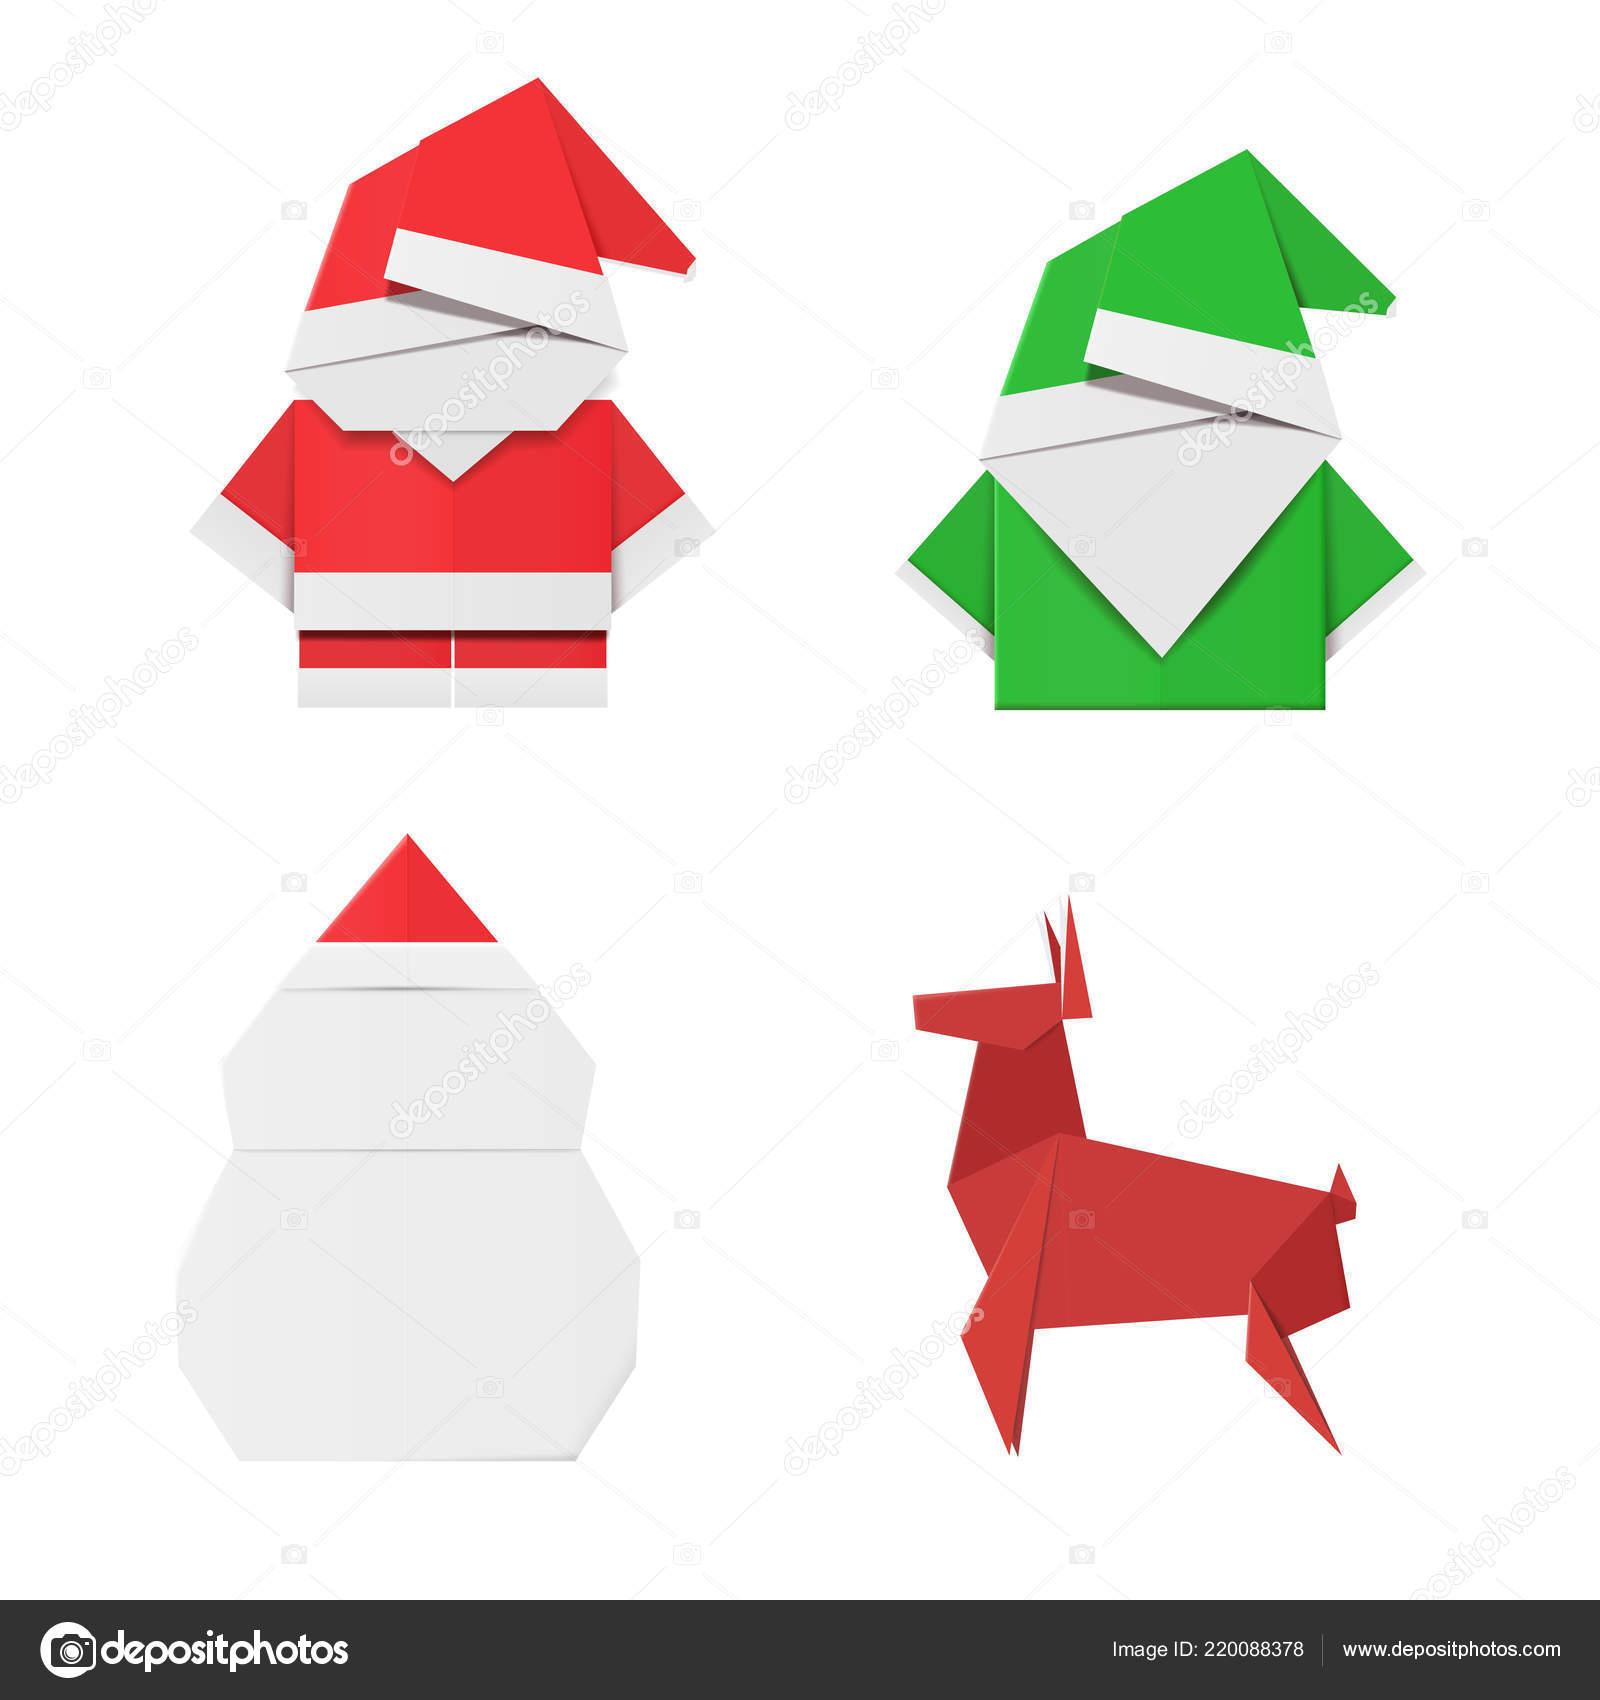 Origami Elf | Set Origami Christmas Characters Santa Claus avec Origami Bonhomme De Neige